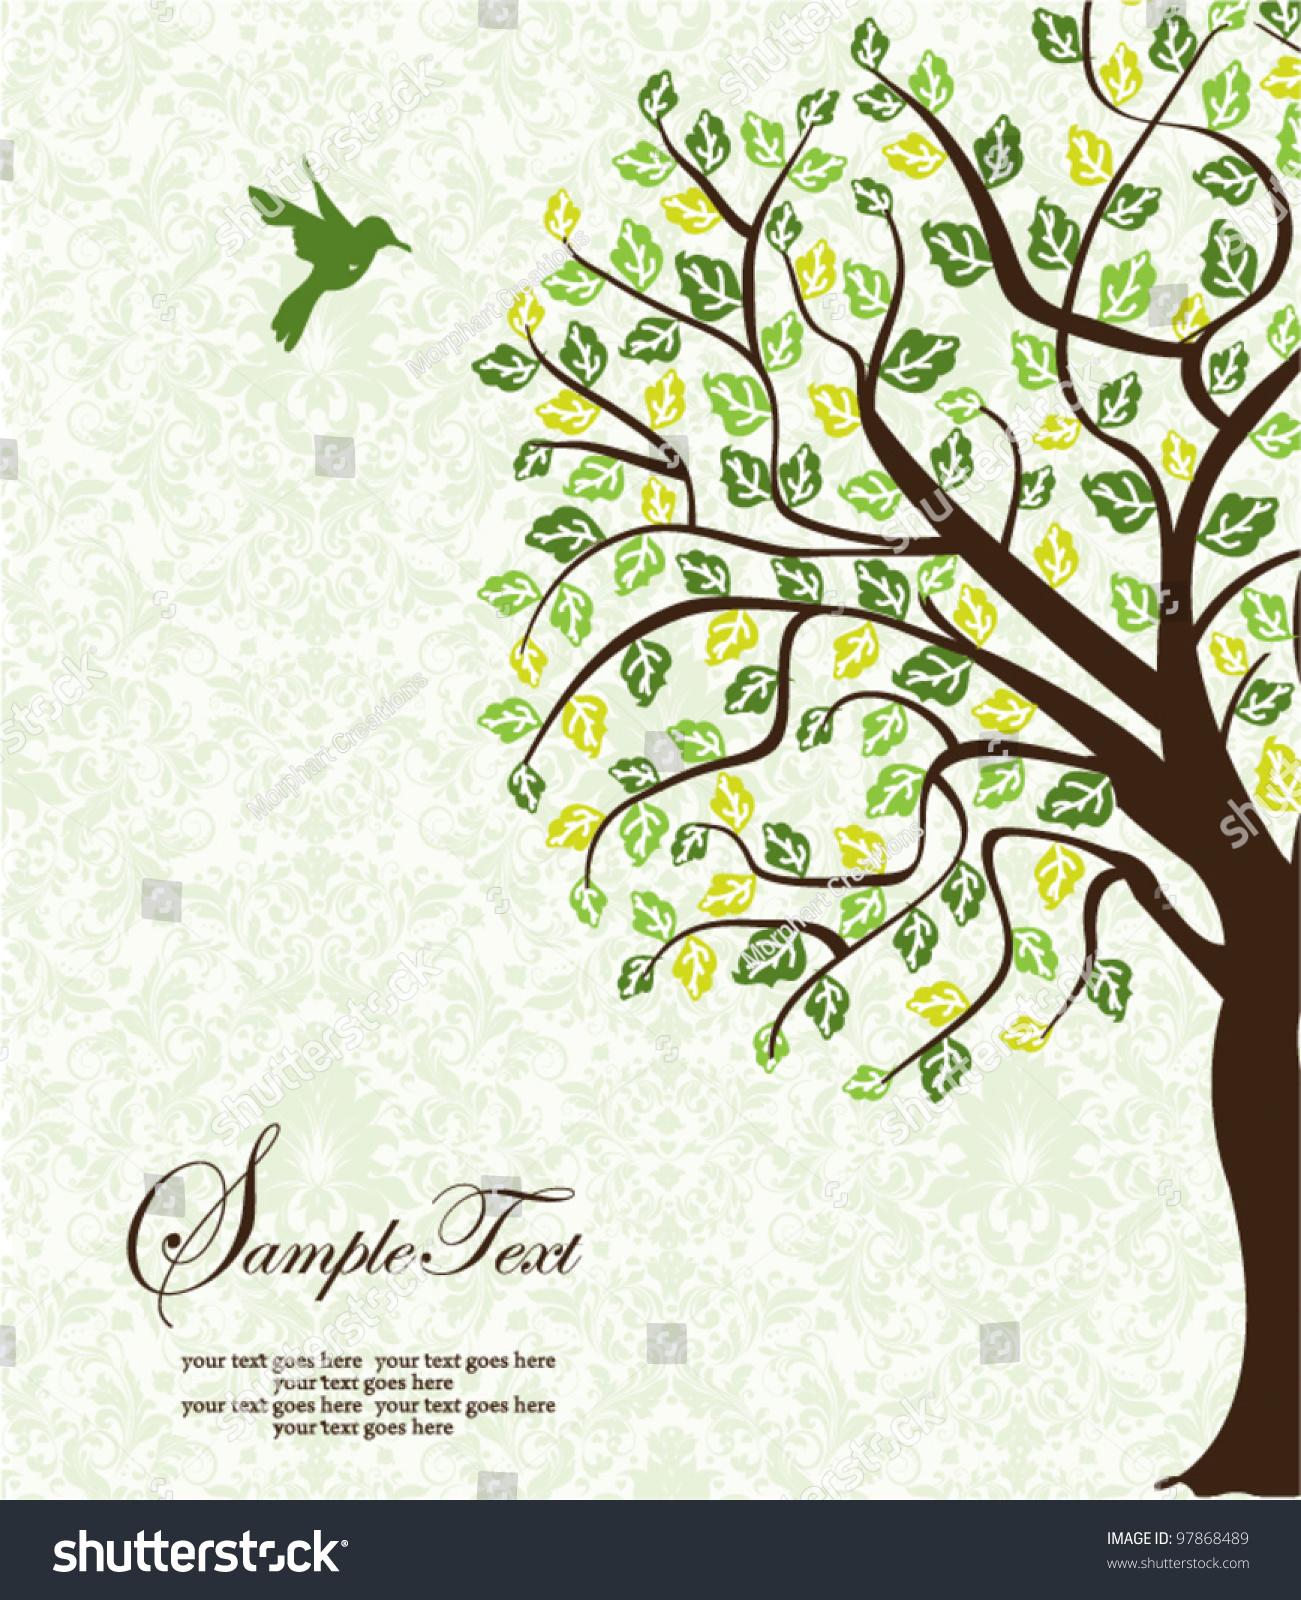 Family Reunion Invitation Card #97868489